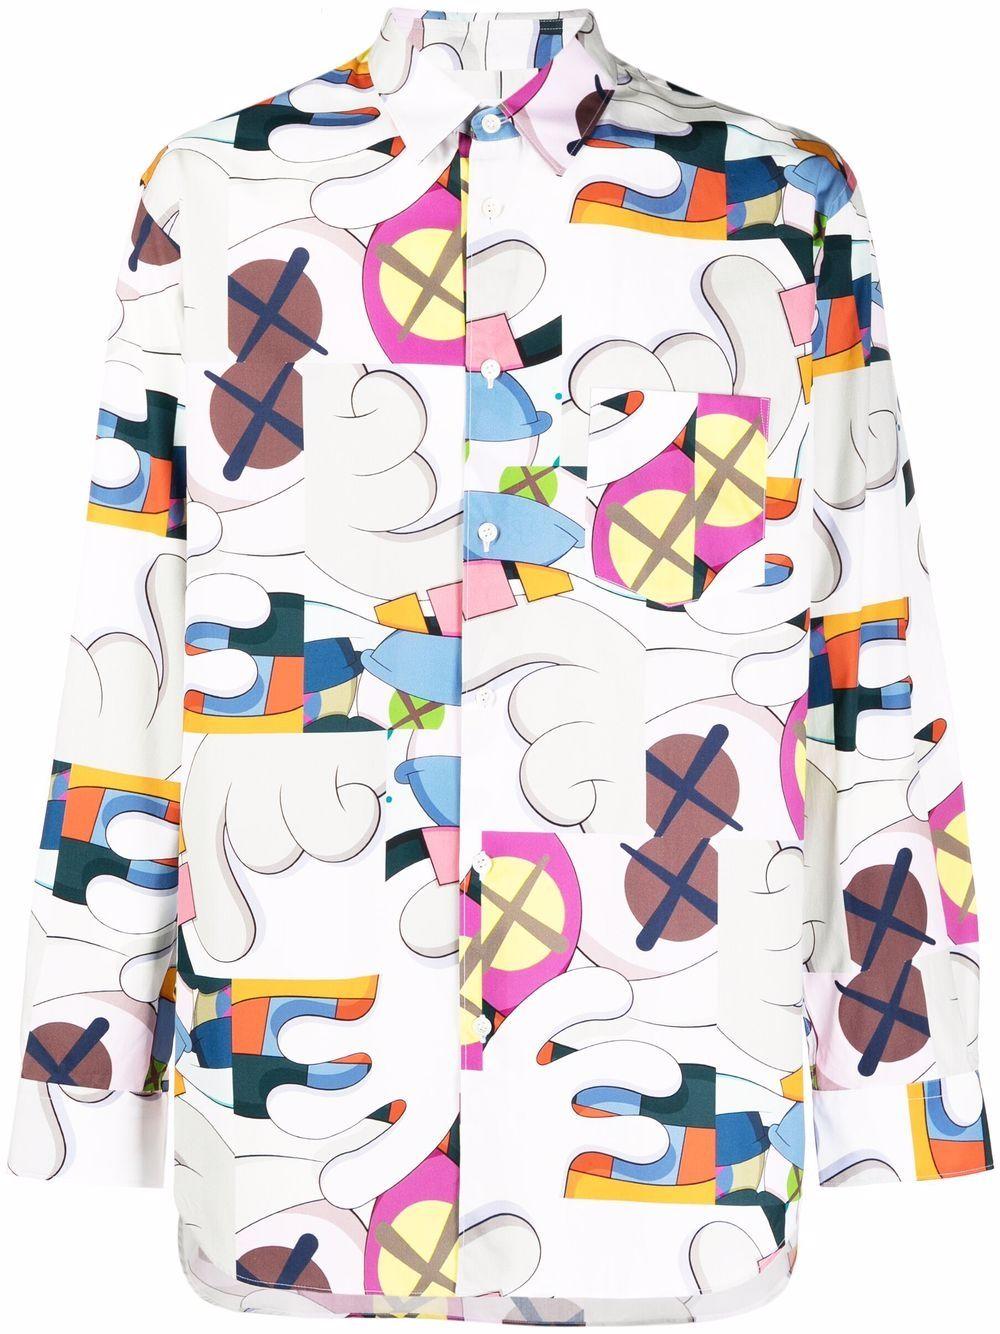 <p class='small-title'>COMME DES GARçONS SHIRT</p>Comme Des Garçons x Kaws Shirt